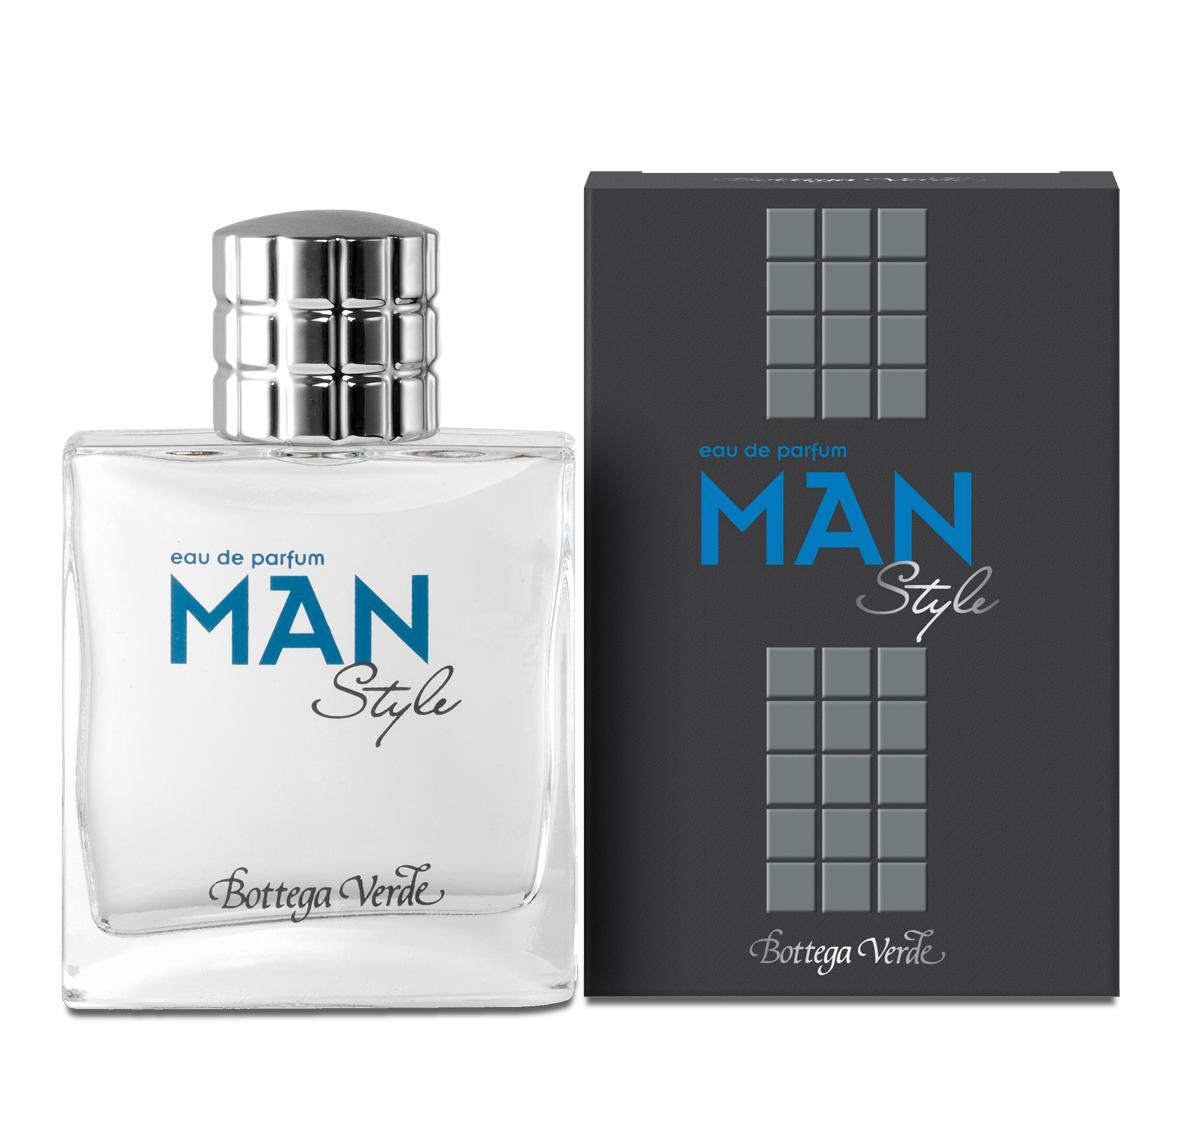 Bottega Verde fragranza Man